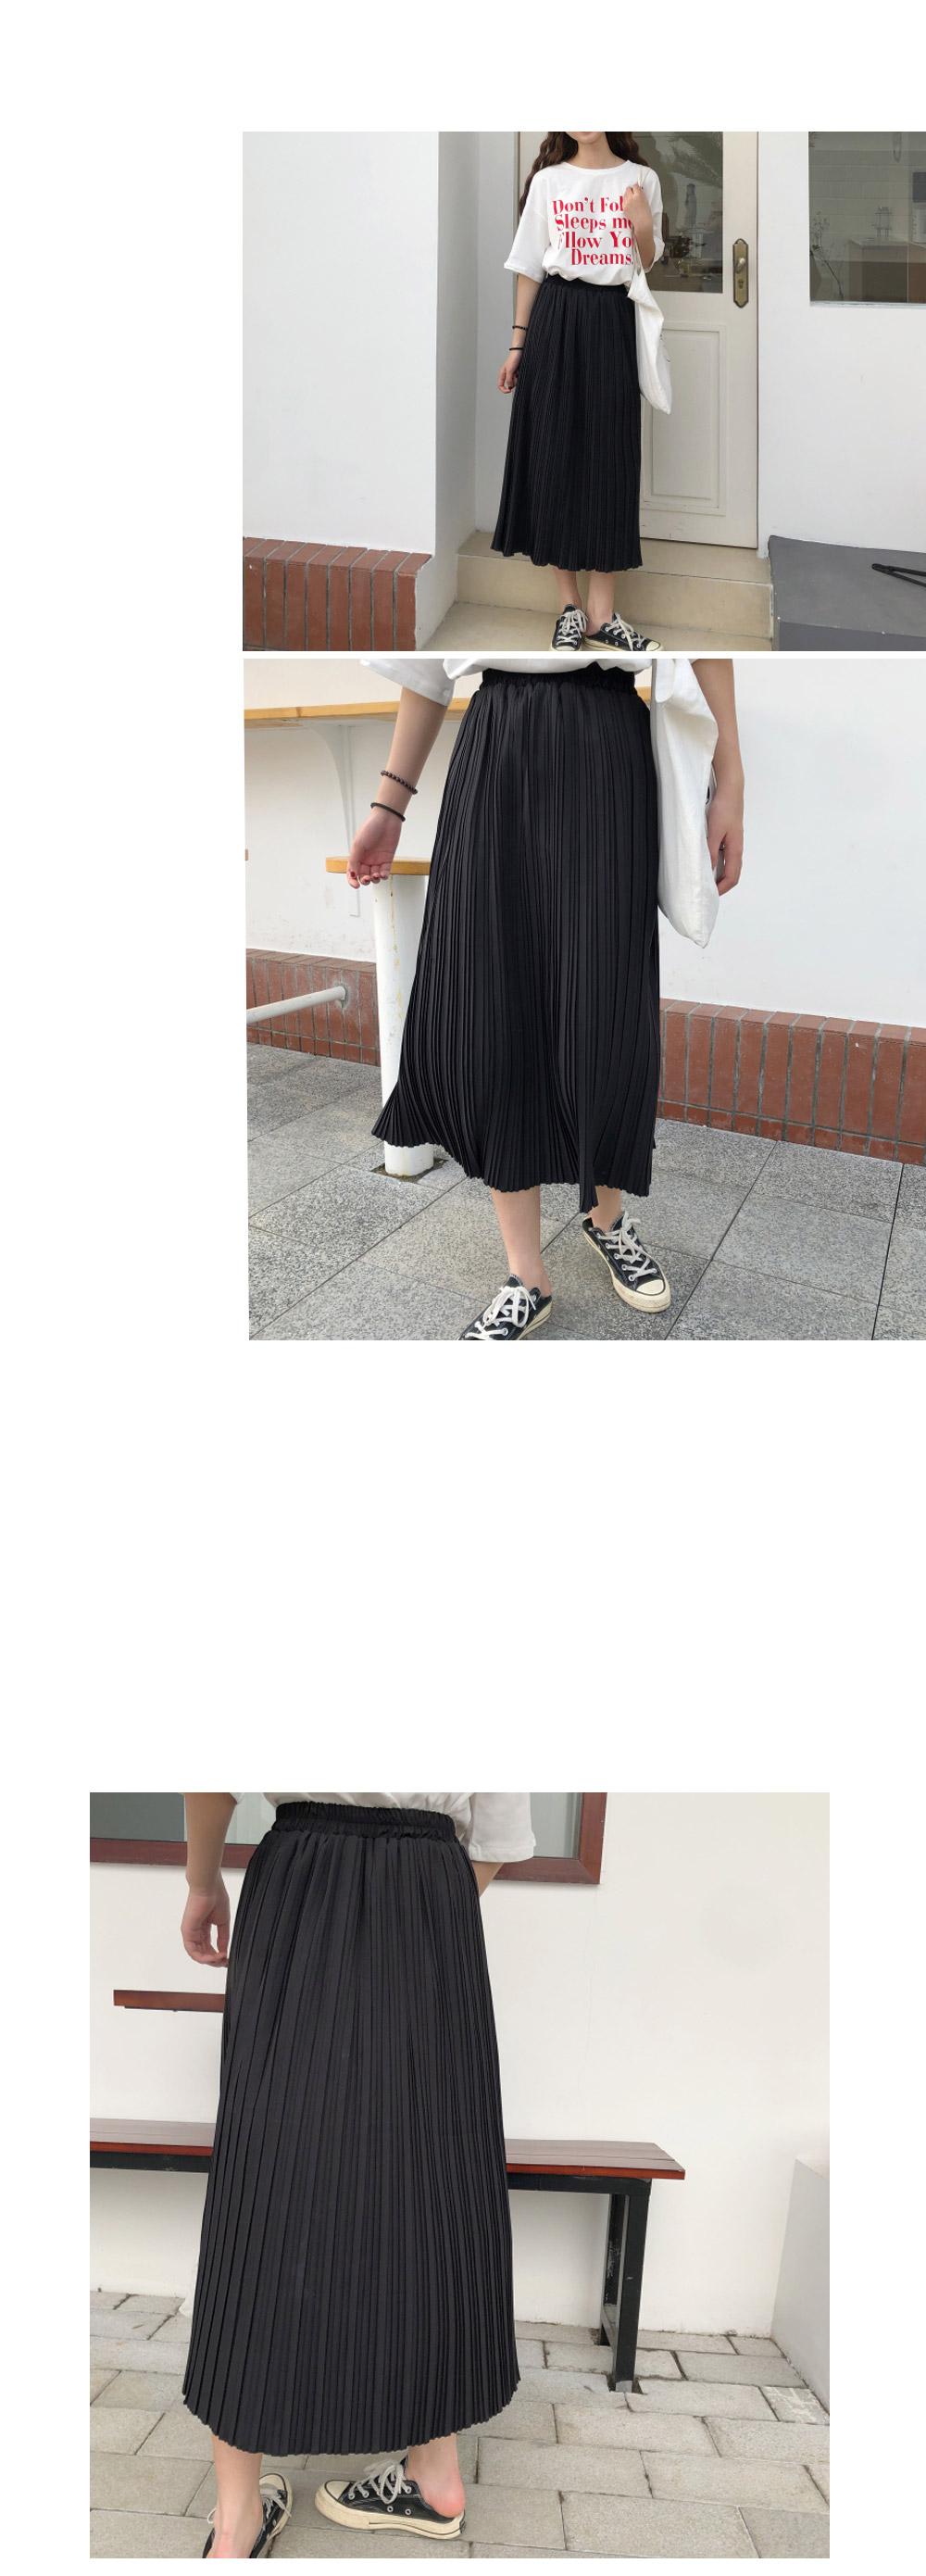 Off-Pleat Skirt